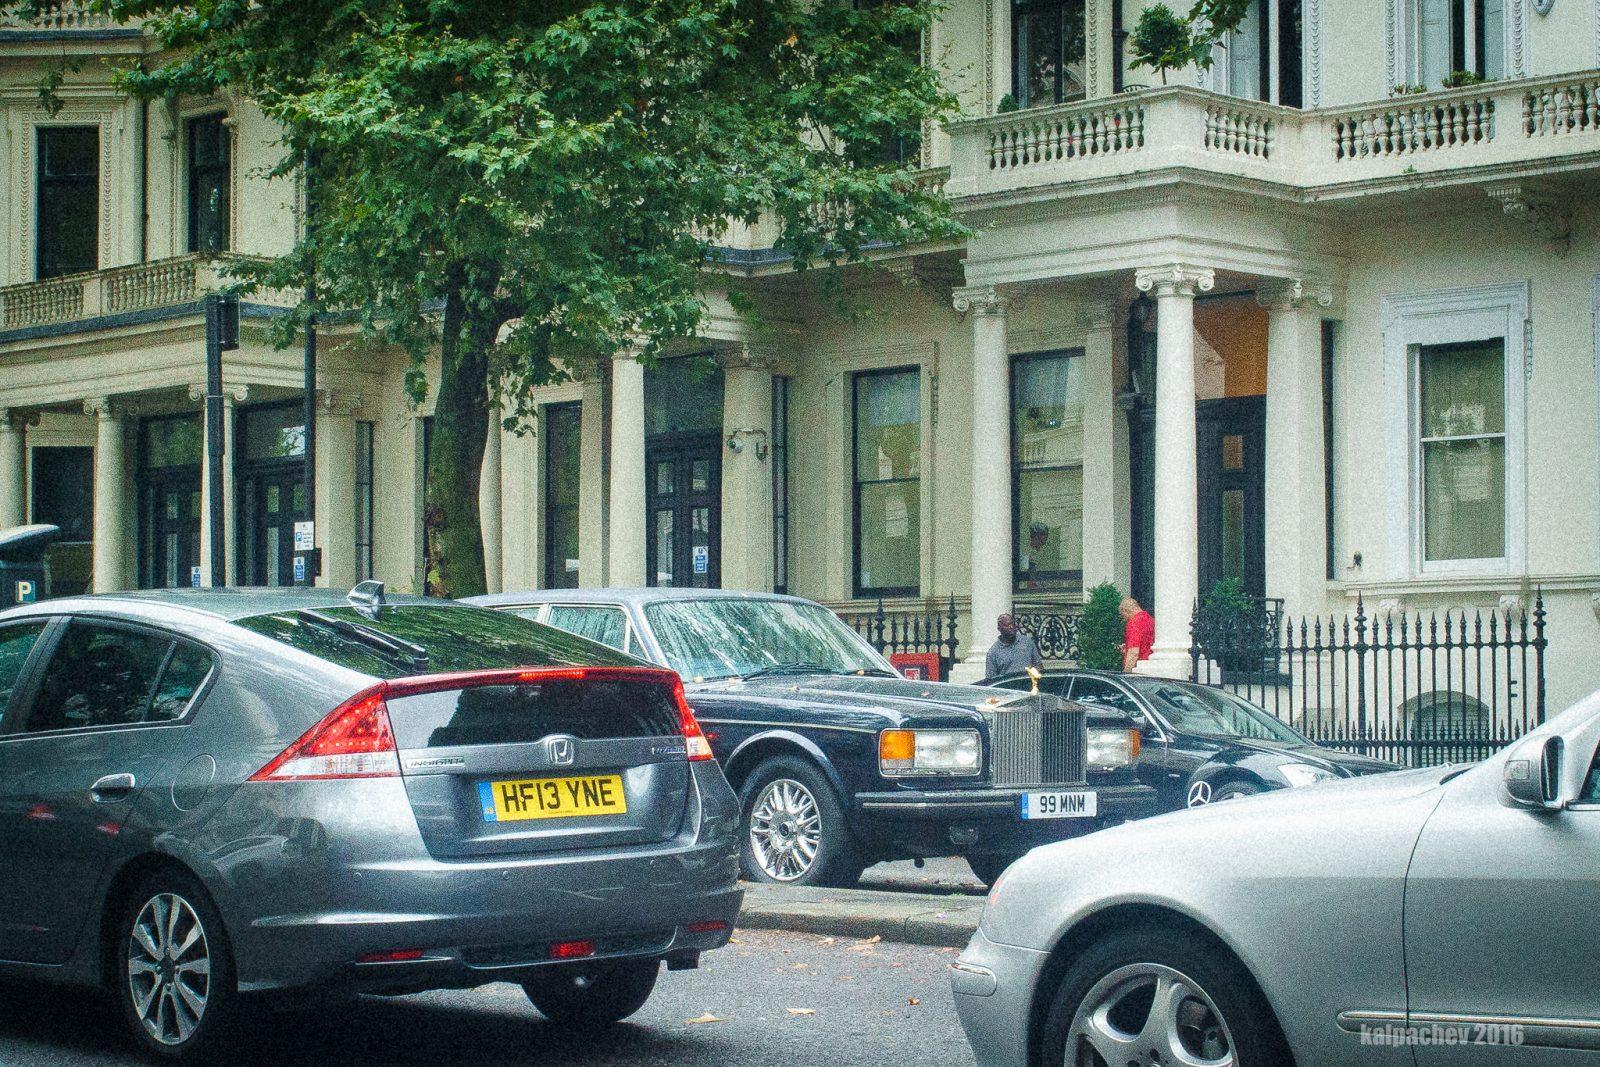 Queens gate, London, UK